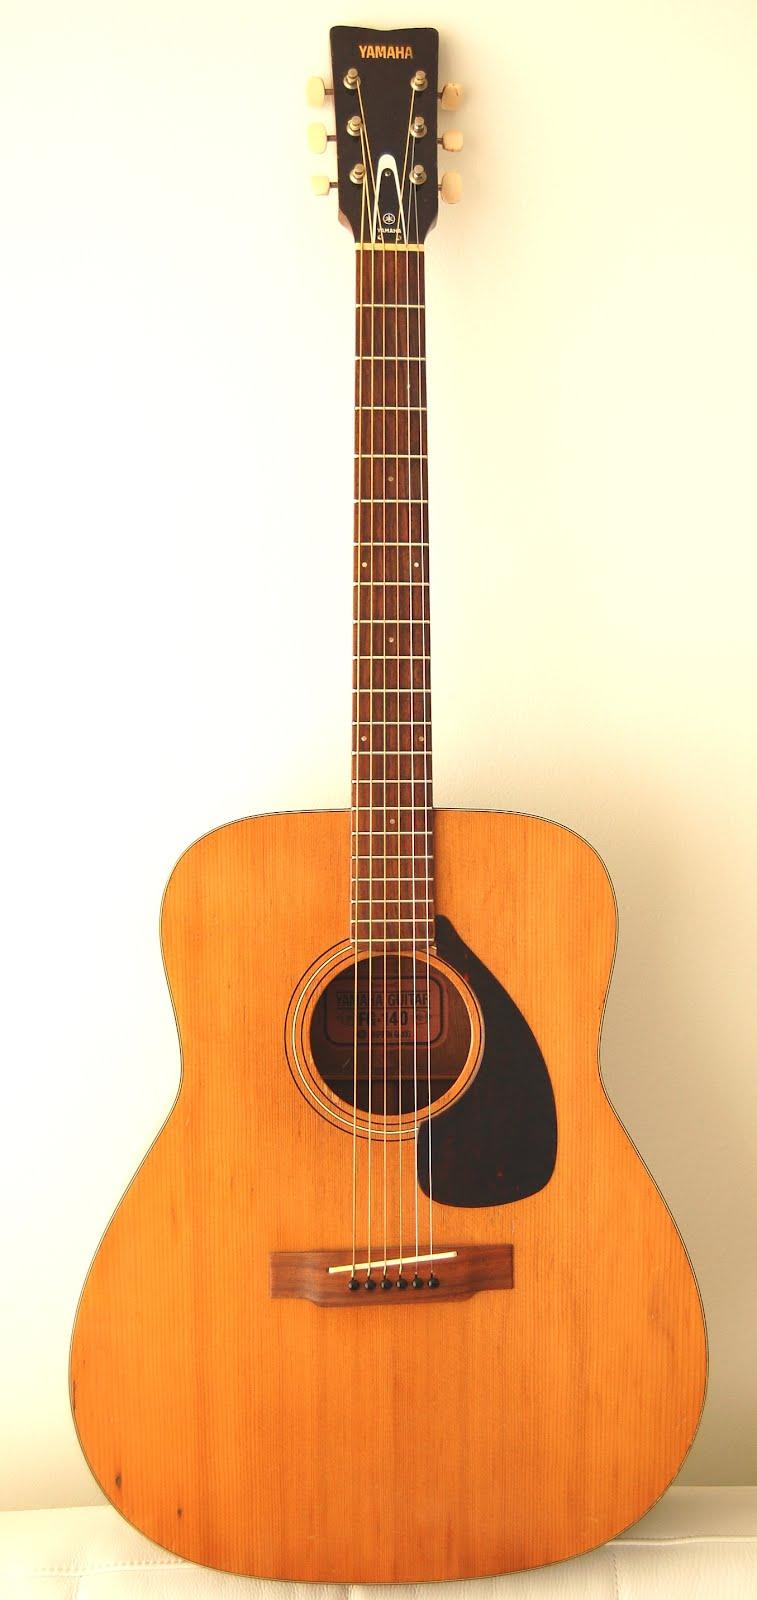 What Yamaha Guitar Strings For A Yamaha Fgs